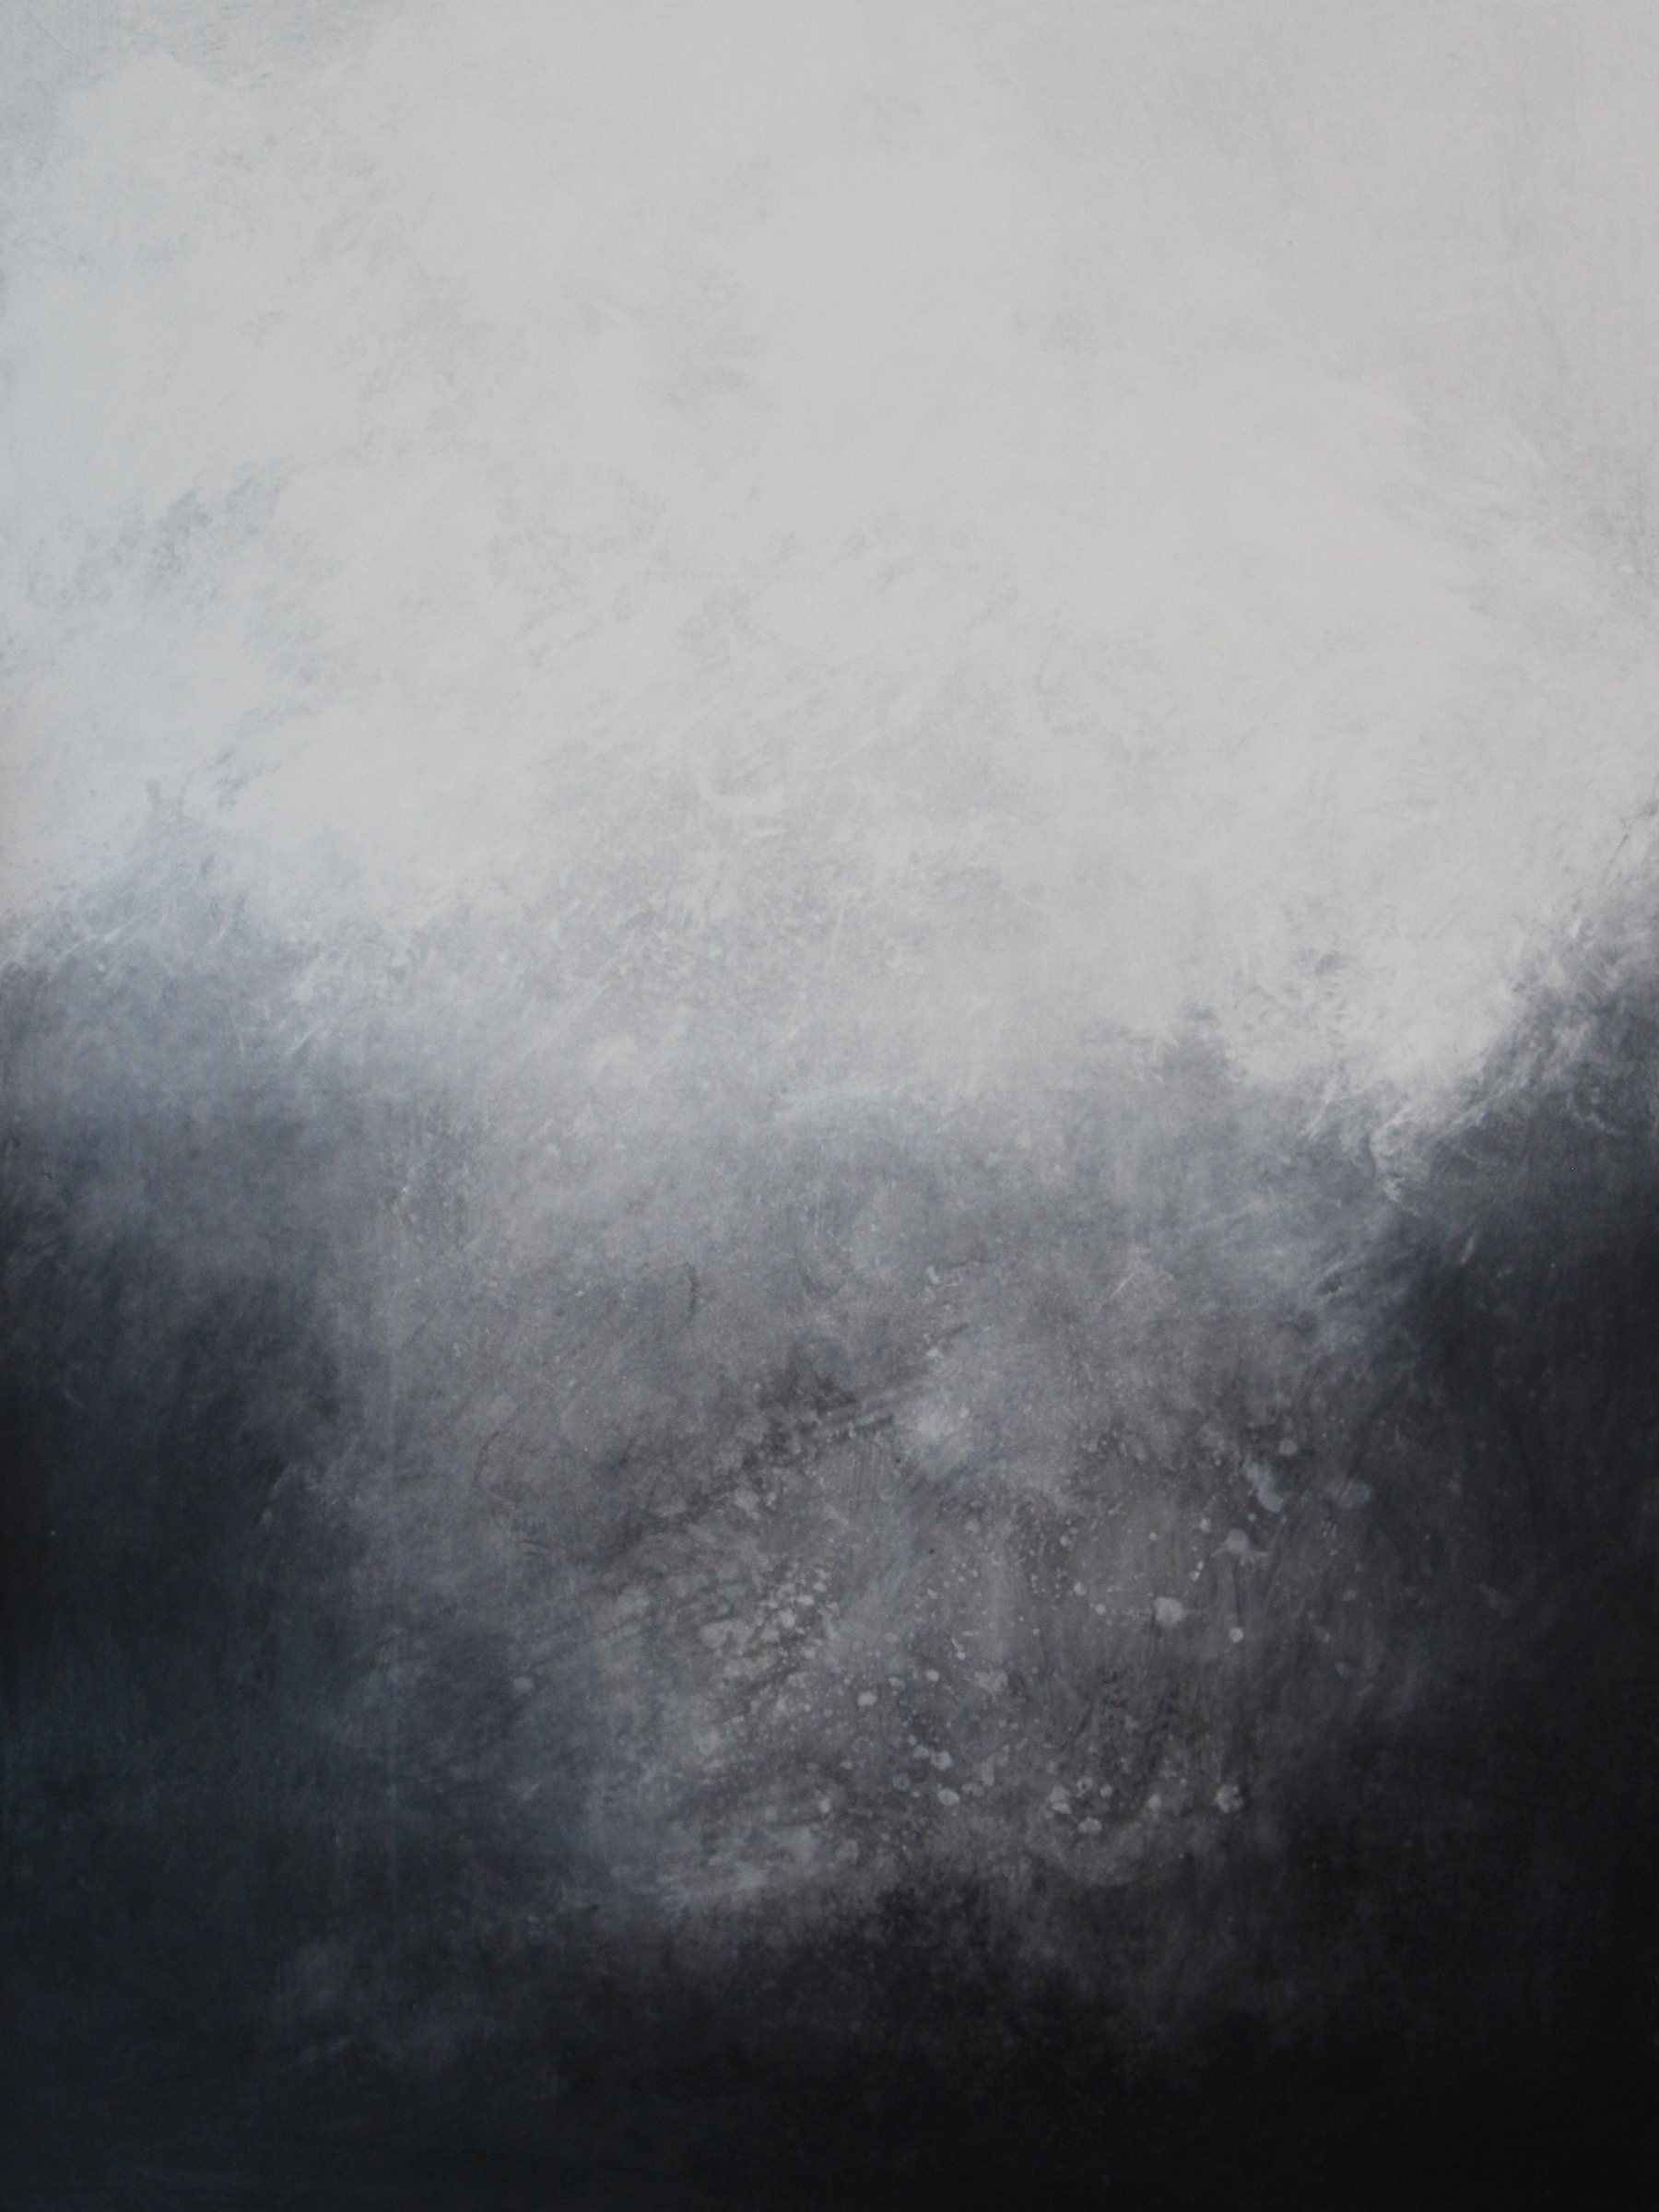 Acrylic on canvas 36 X 48 Buy $500 Rent per week $150